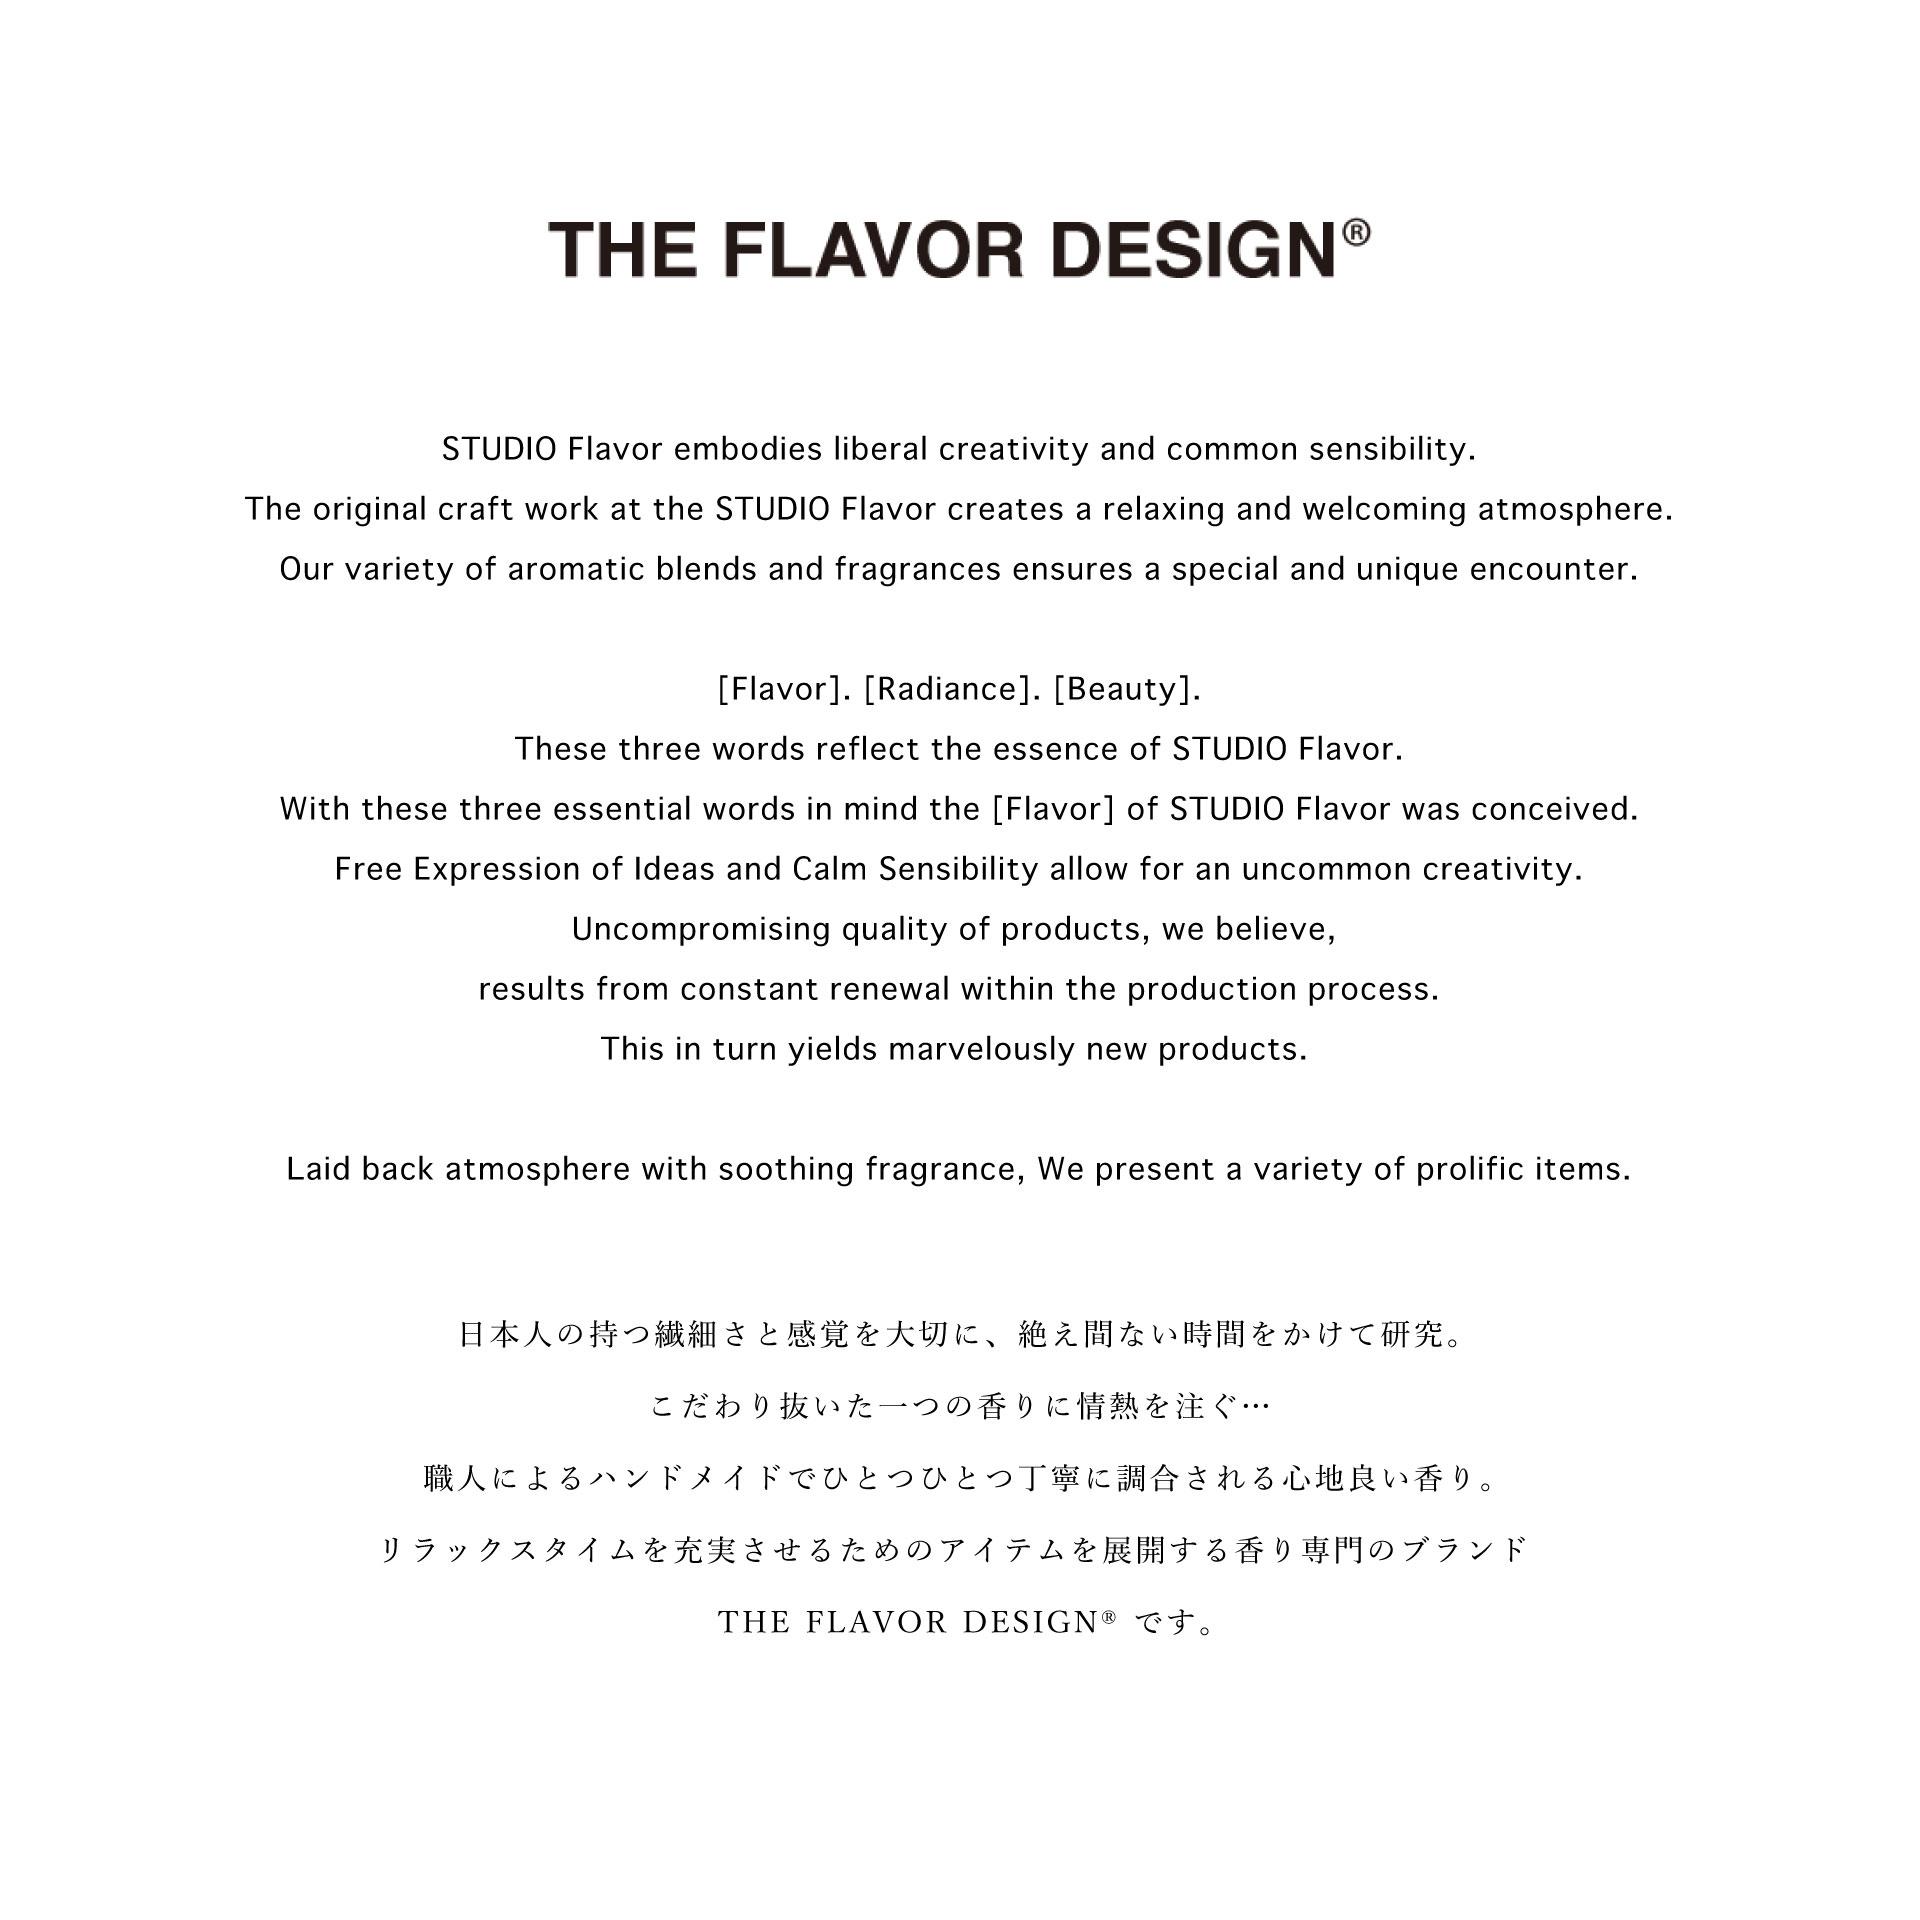 THE FLAVOR DESIGN